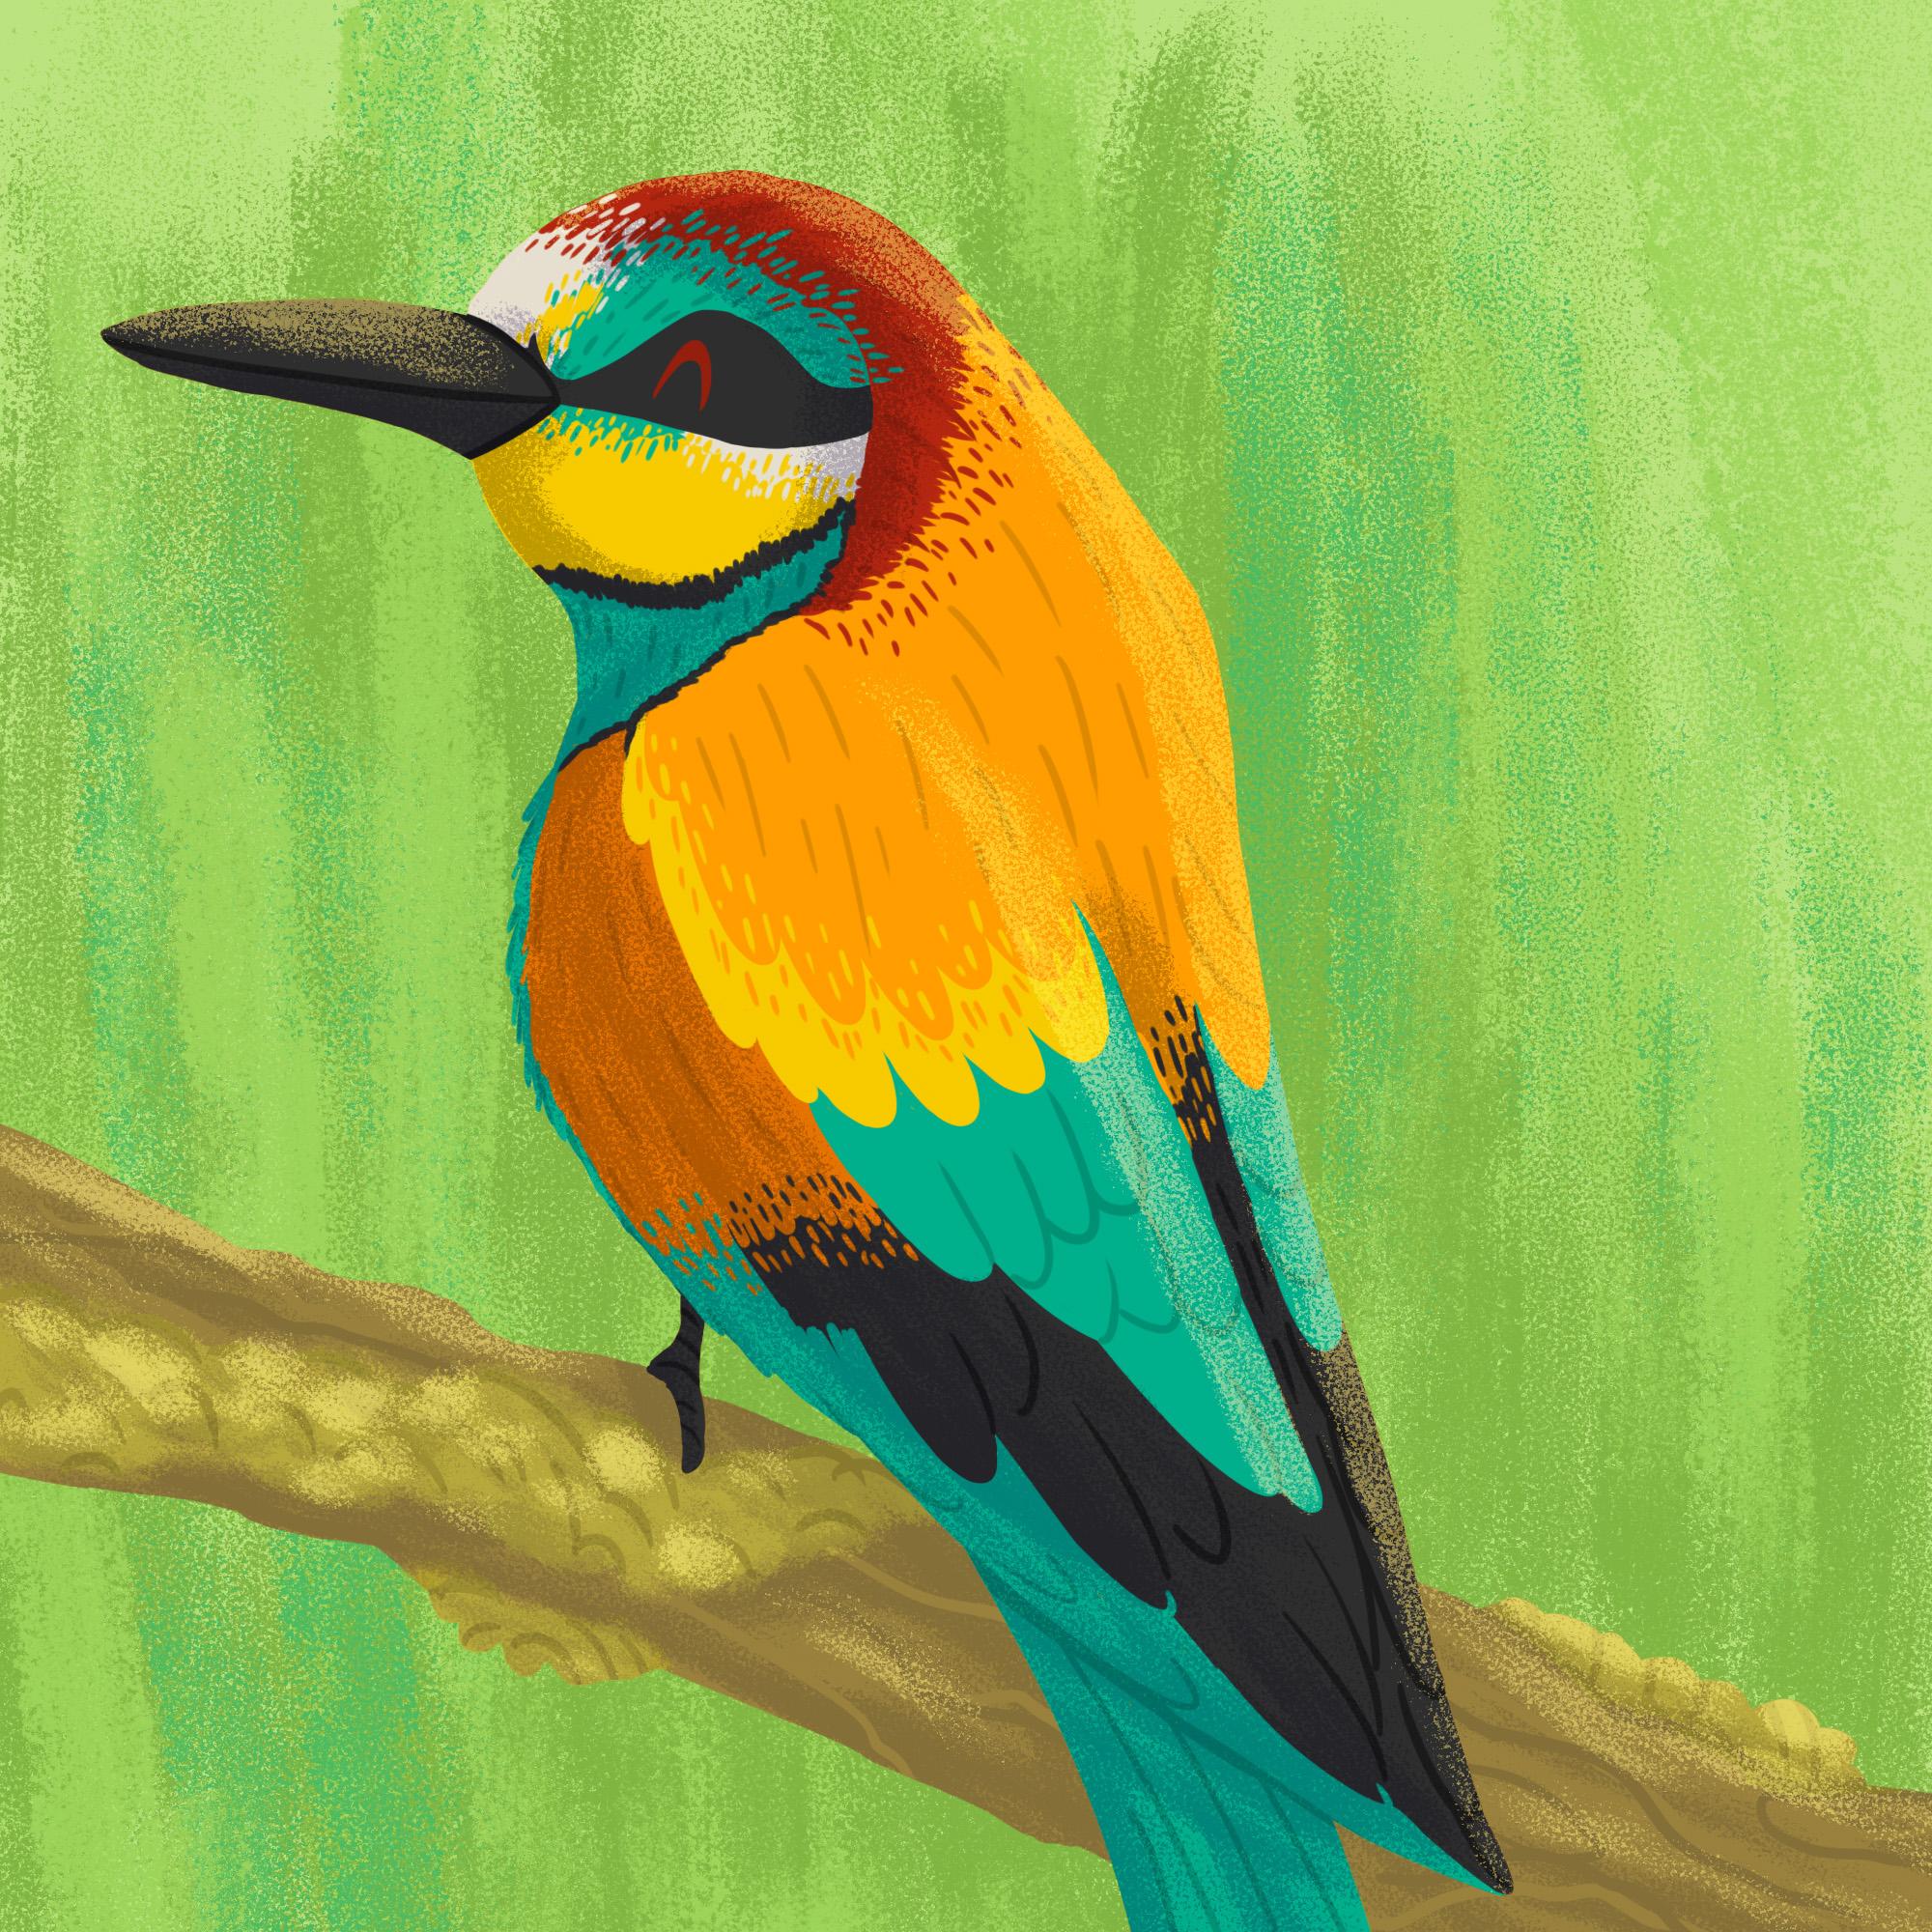 Bird04.jpg